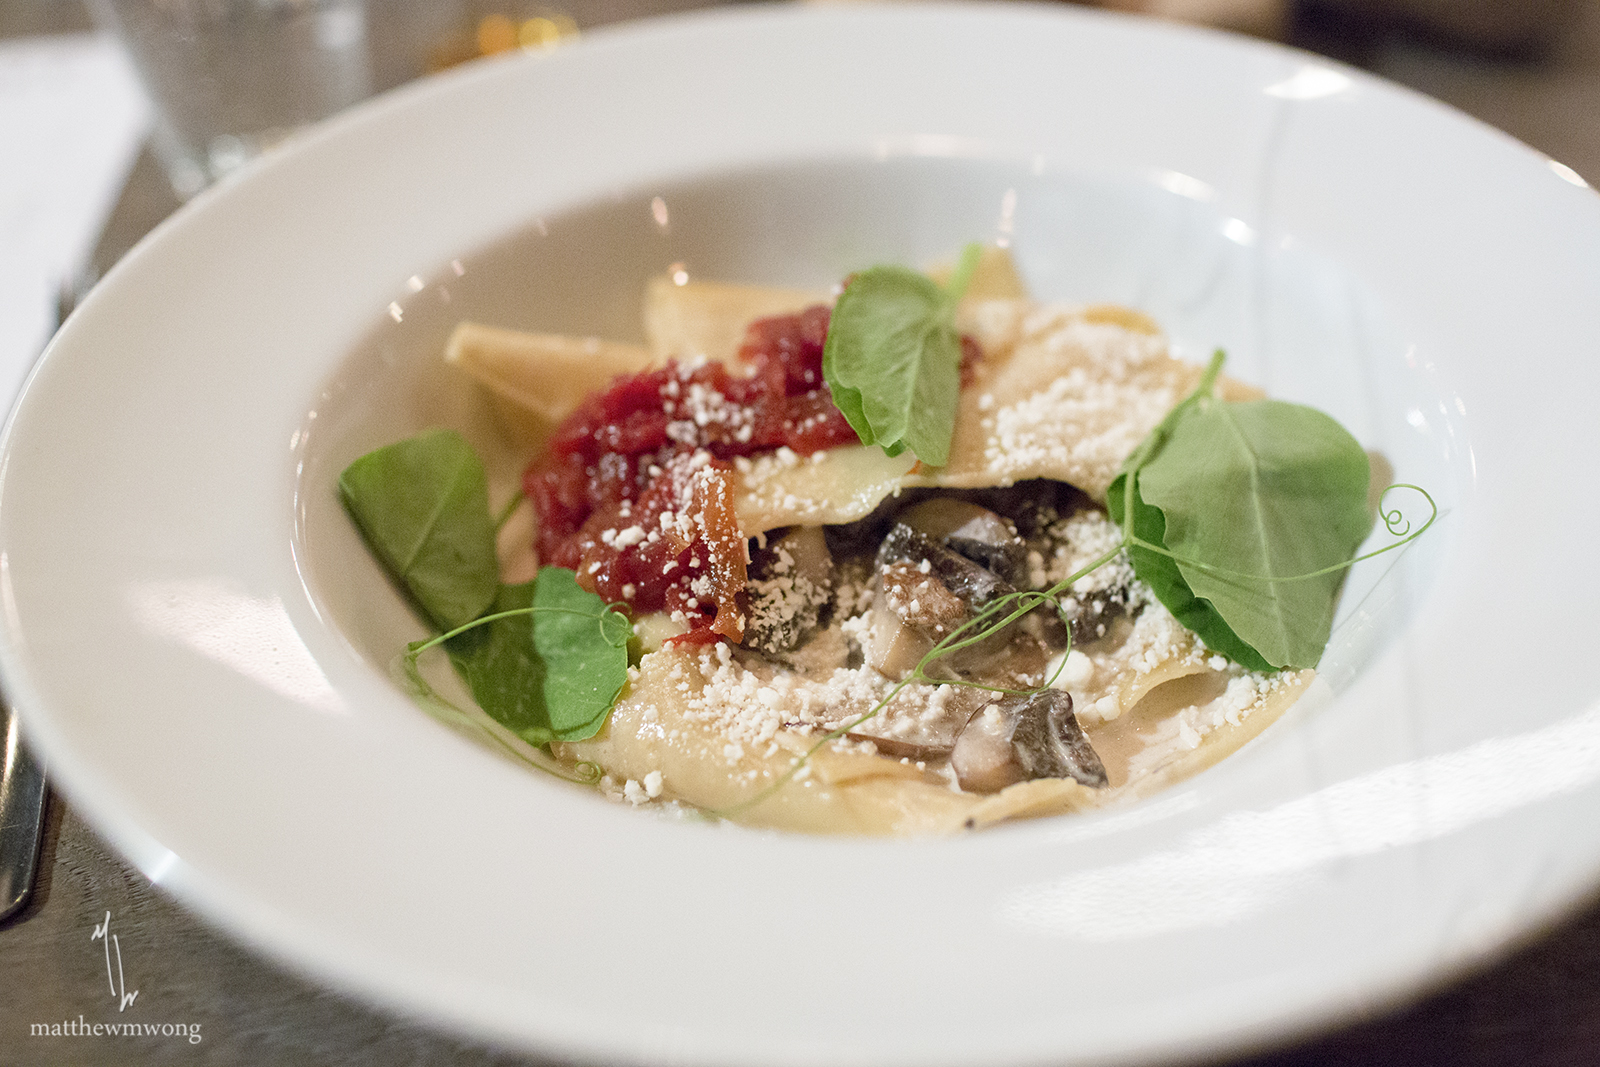 Silk Handkerchief pasta, wild mushroom confit, tomato marmalade, porcini cream